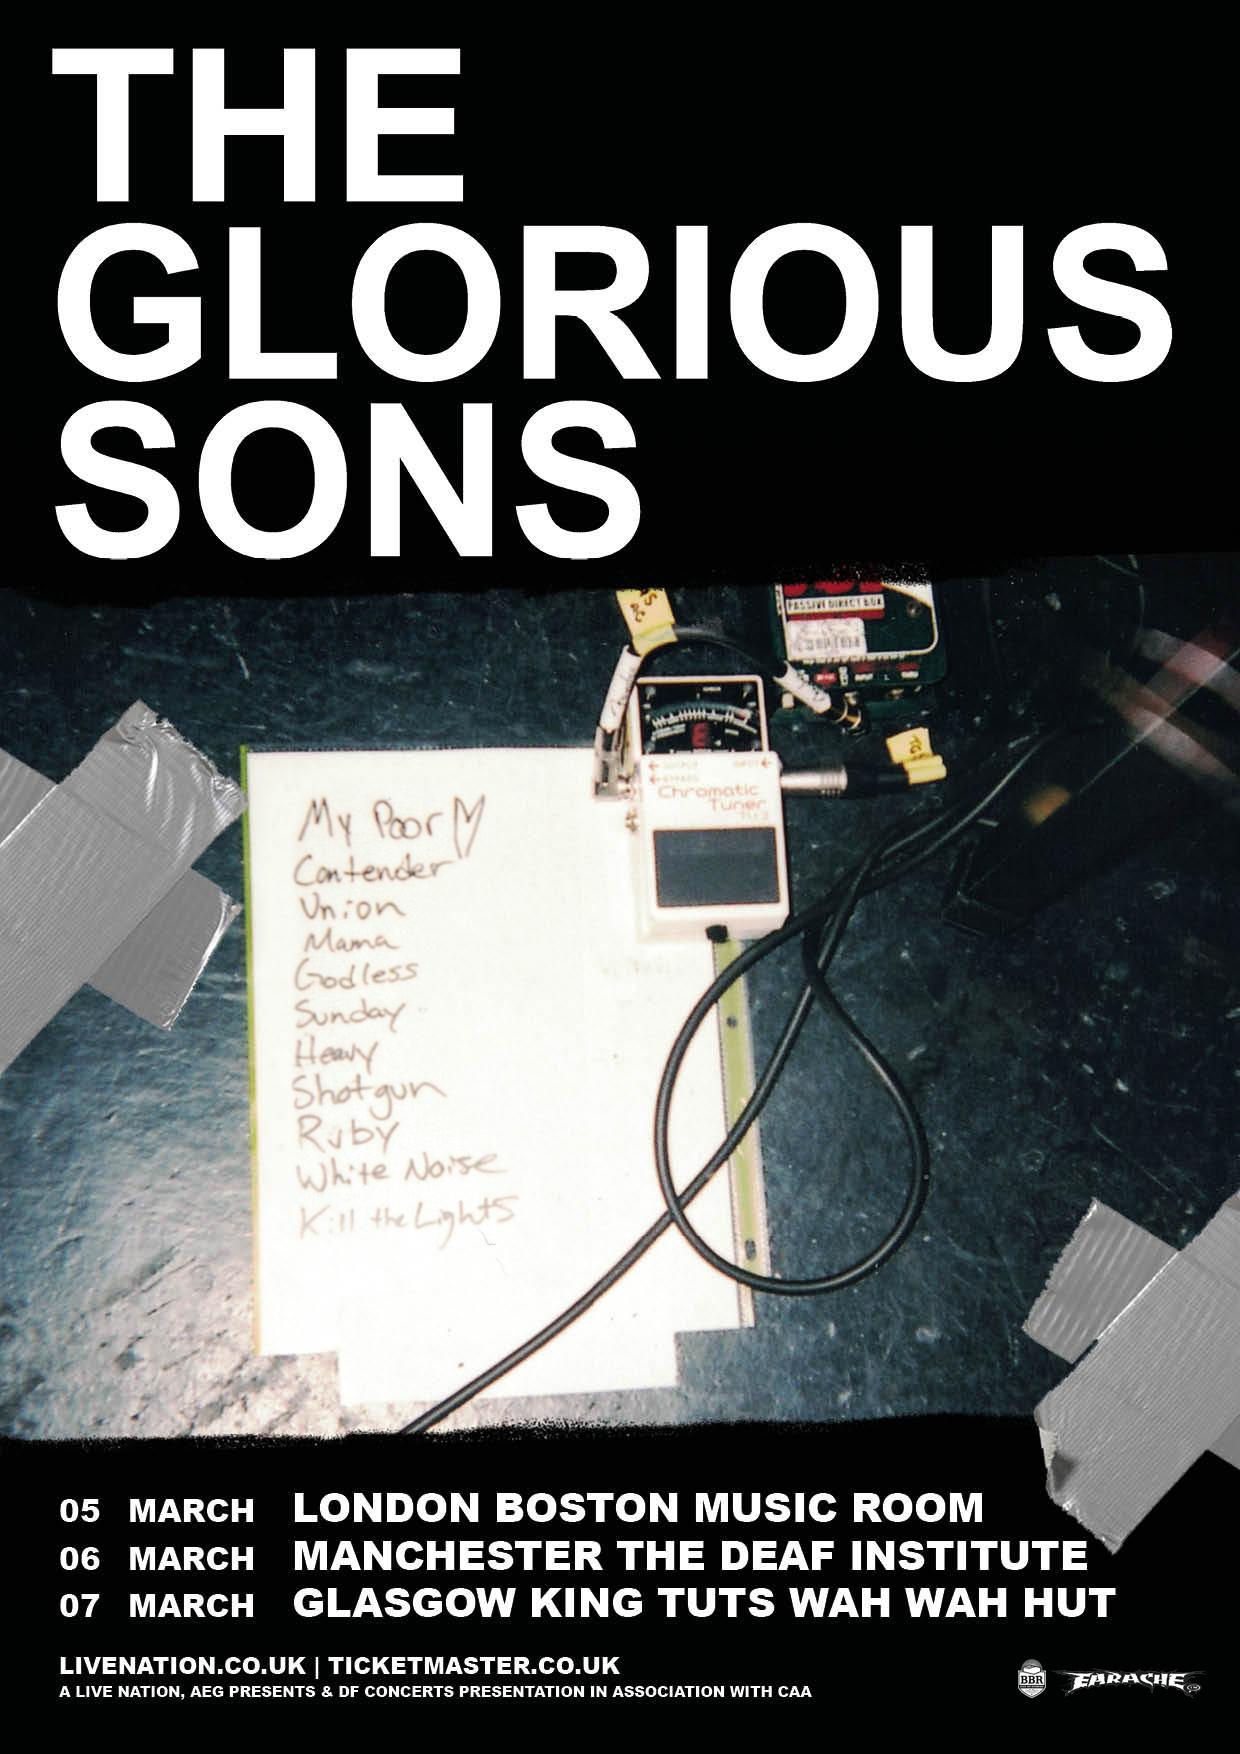 The Glorious Sons Admat-REVISED2.jpg